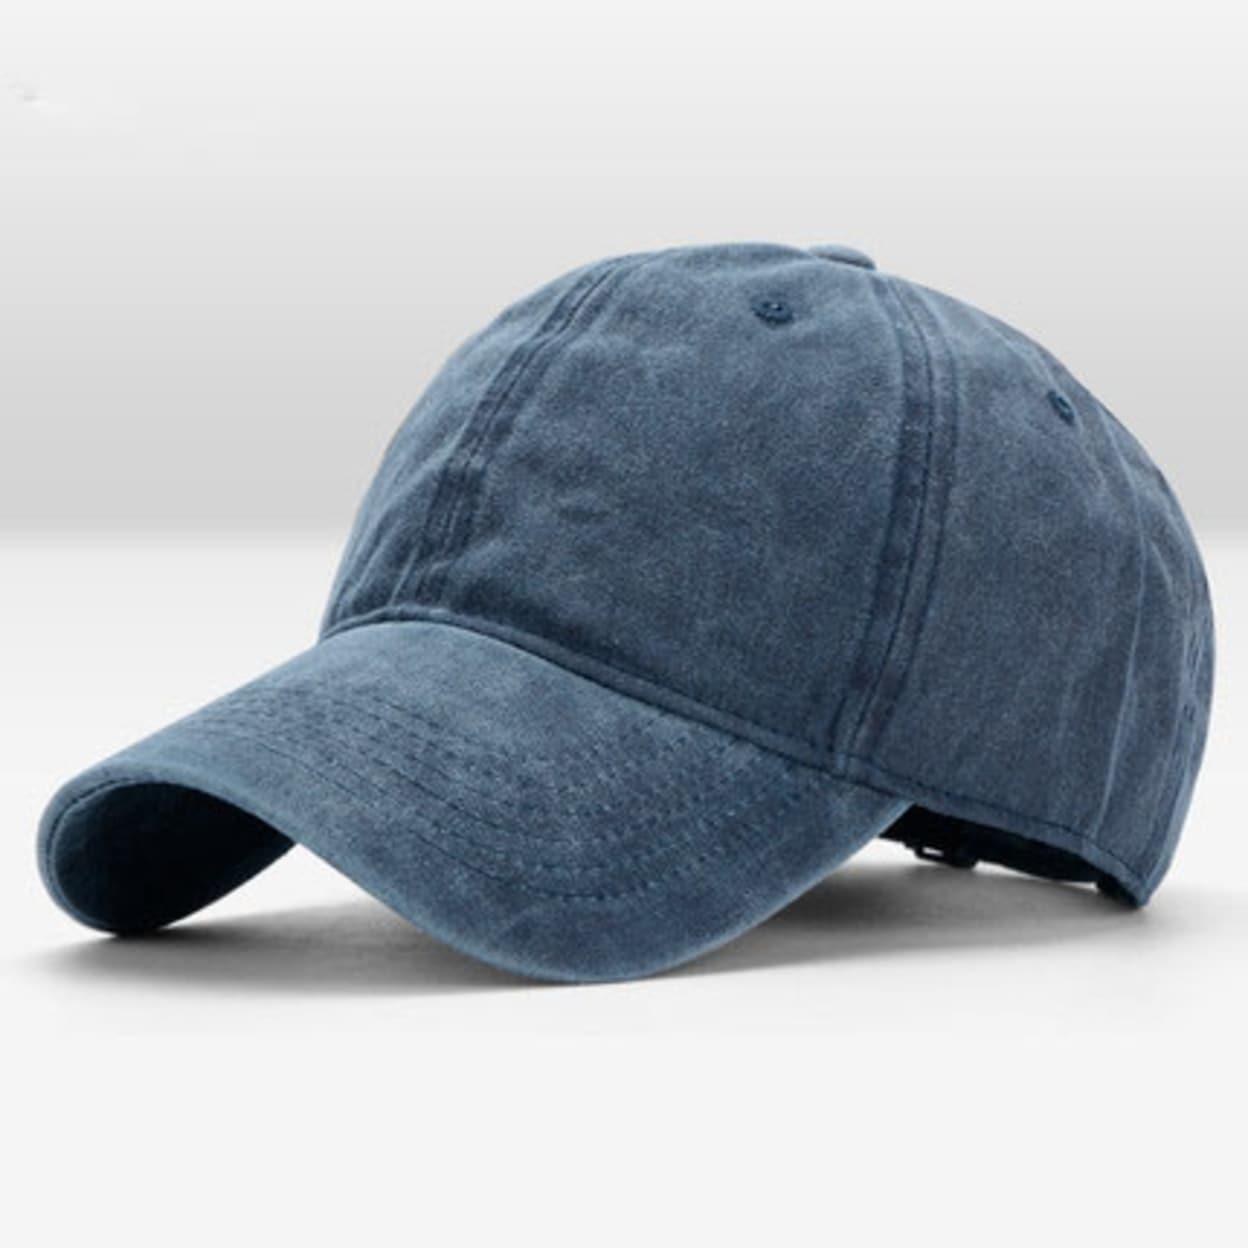 87a04c8f6b Navy Blue Vintage Washed Dyed Cotton Hats Twill Low Profile Plain  Adjustable Women Men Hat Retro Baseball Caps